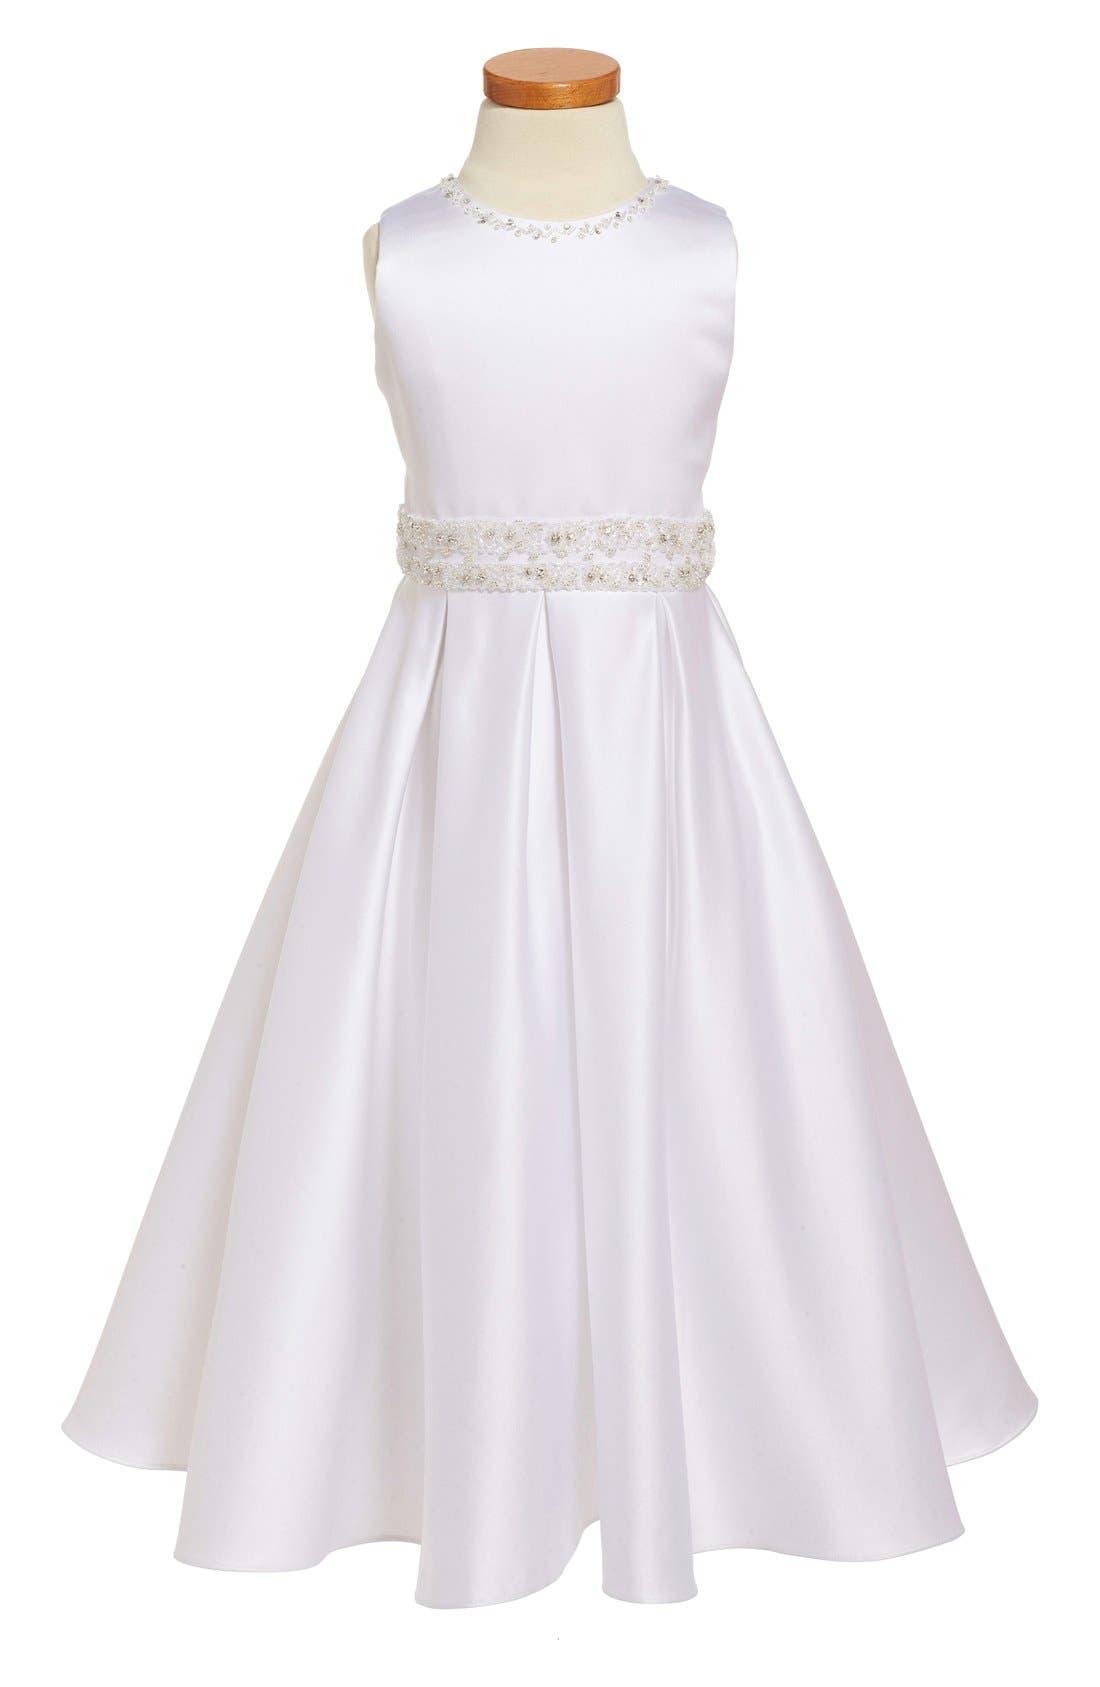 JOAN CALABRESE FOR MON CHERI,                             Satin First Communion Dress,                             Main thumbnail 1, color,                             100